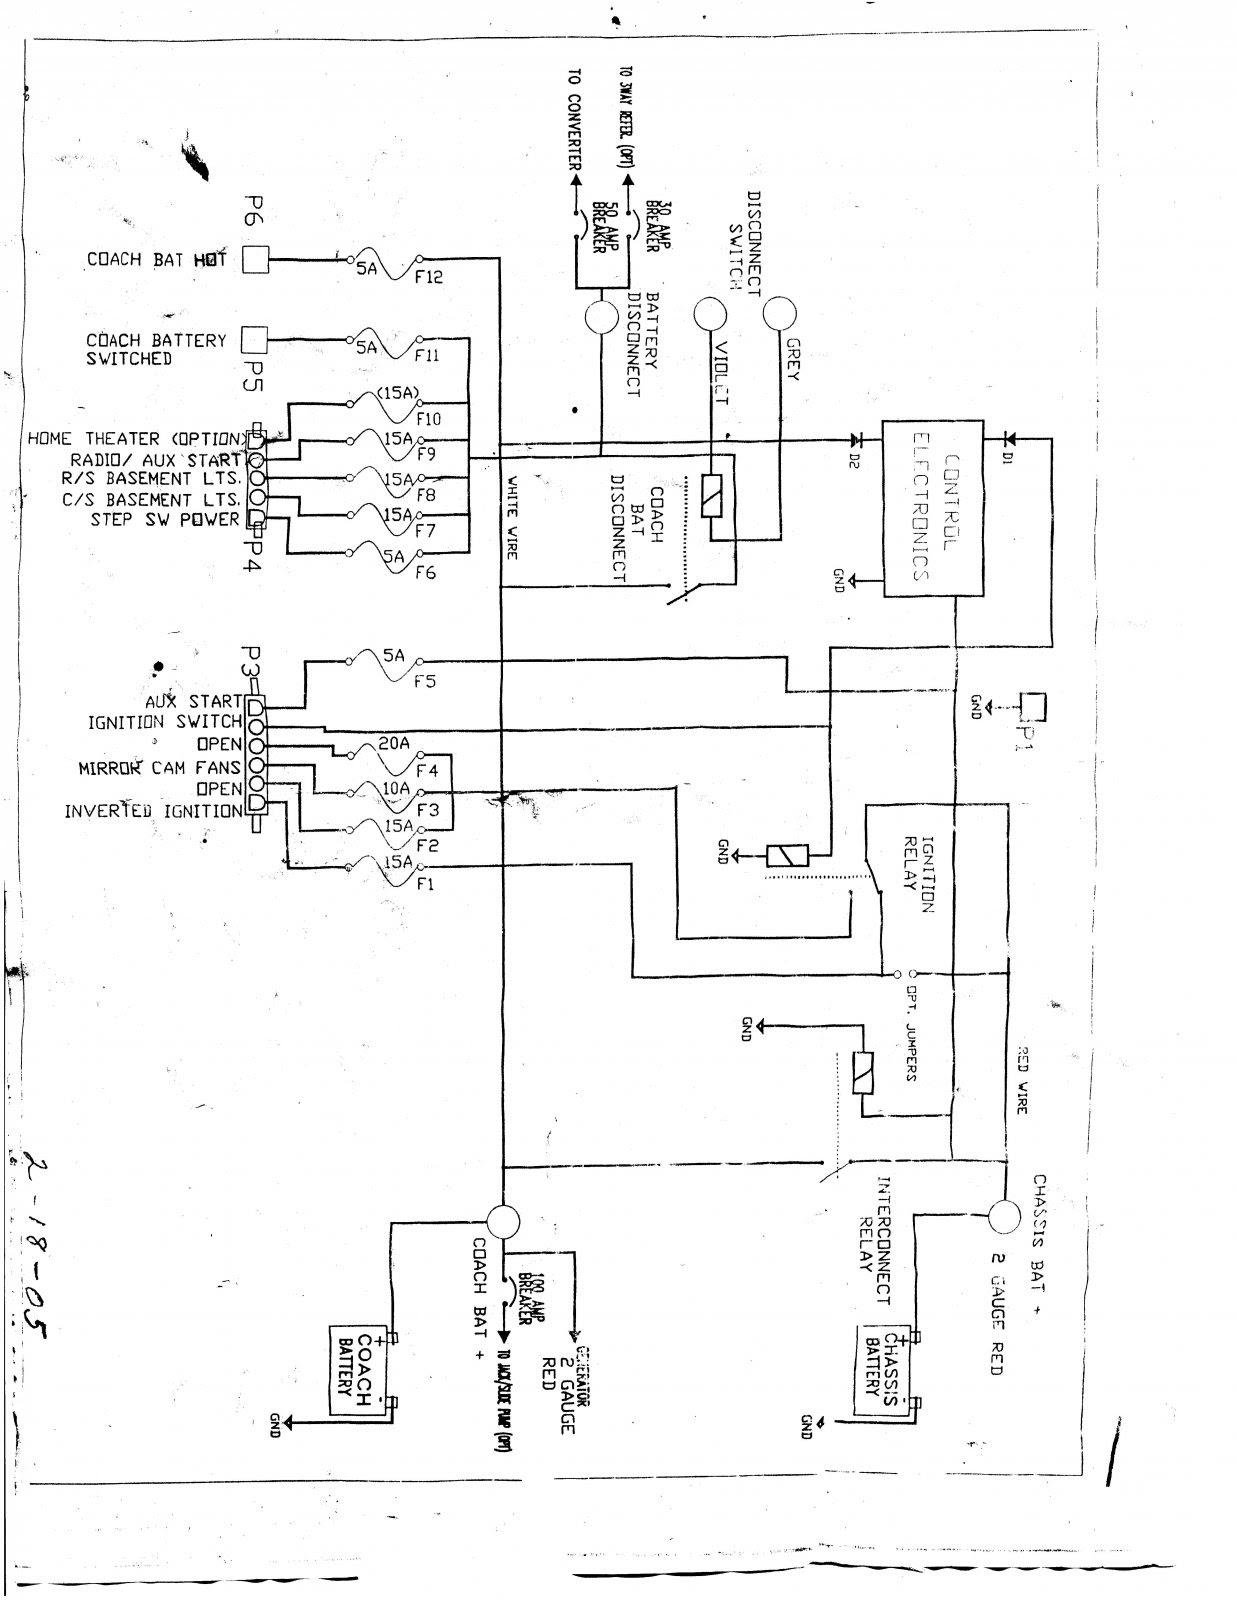 2000 Sterling Truck Wiring Diagram 2002 Monaco Wiring Diagram Cts Lsa Yenpancane Jeanjaures37 Fr